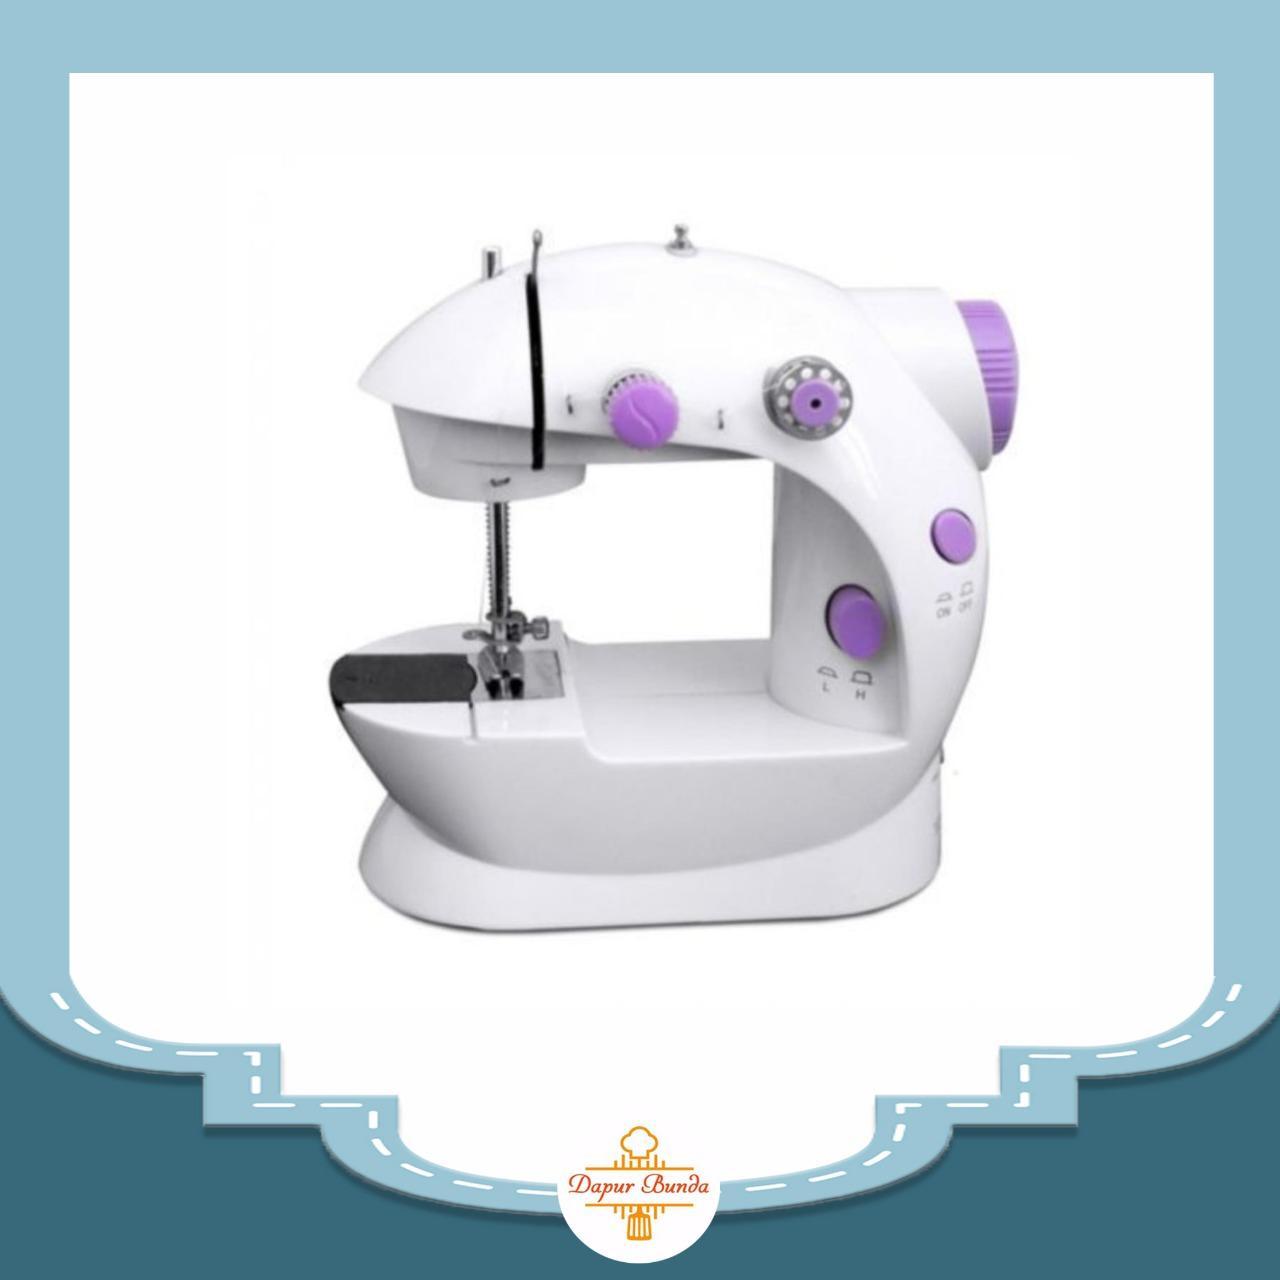 Dapurbunda Mesin Jahit Mini Portable Fhsm 202 ( Ada Lampu) /mesin Jahit Portable Murah By Dapurbunda.